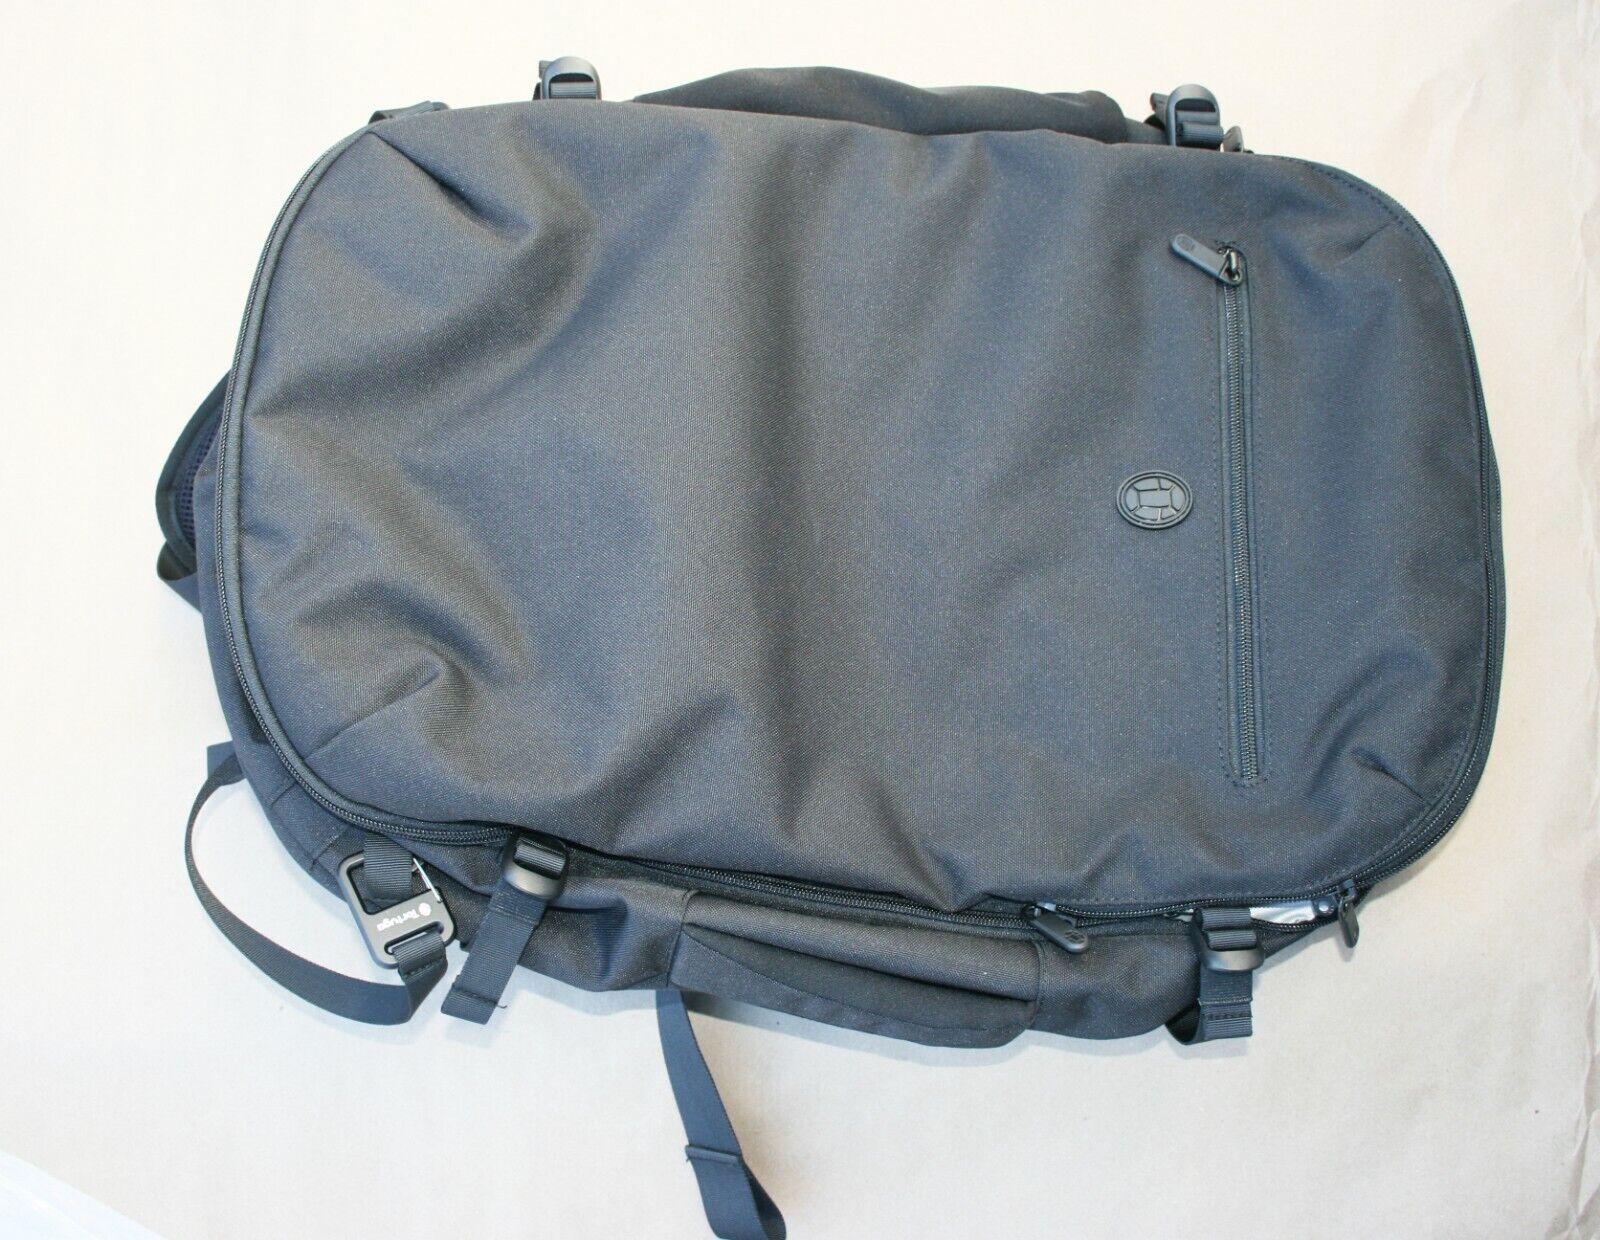 Tortuga Back Pack Women - $149.00